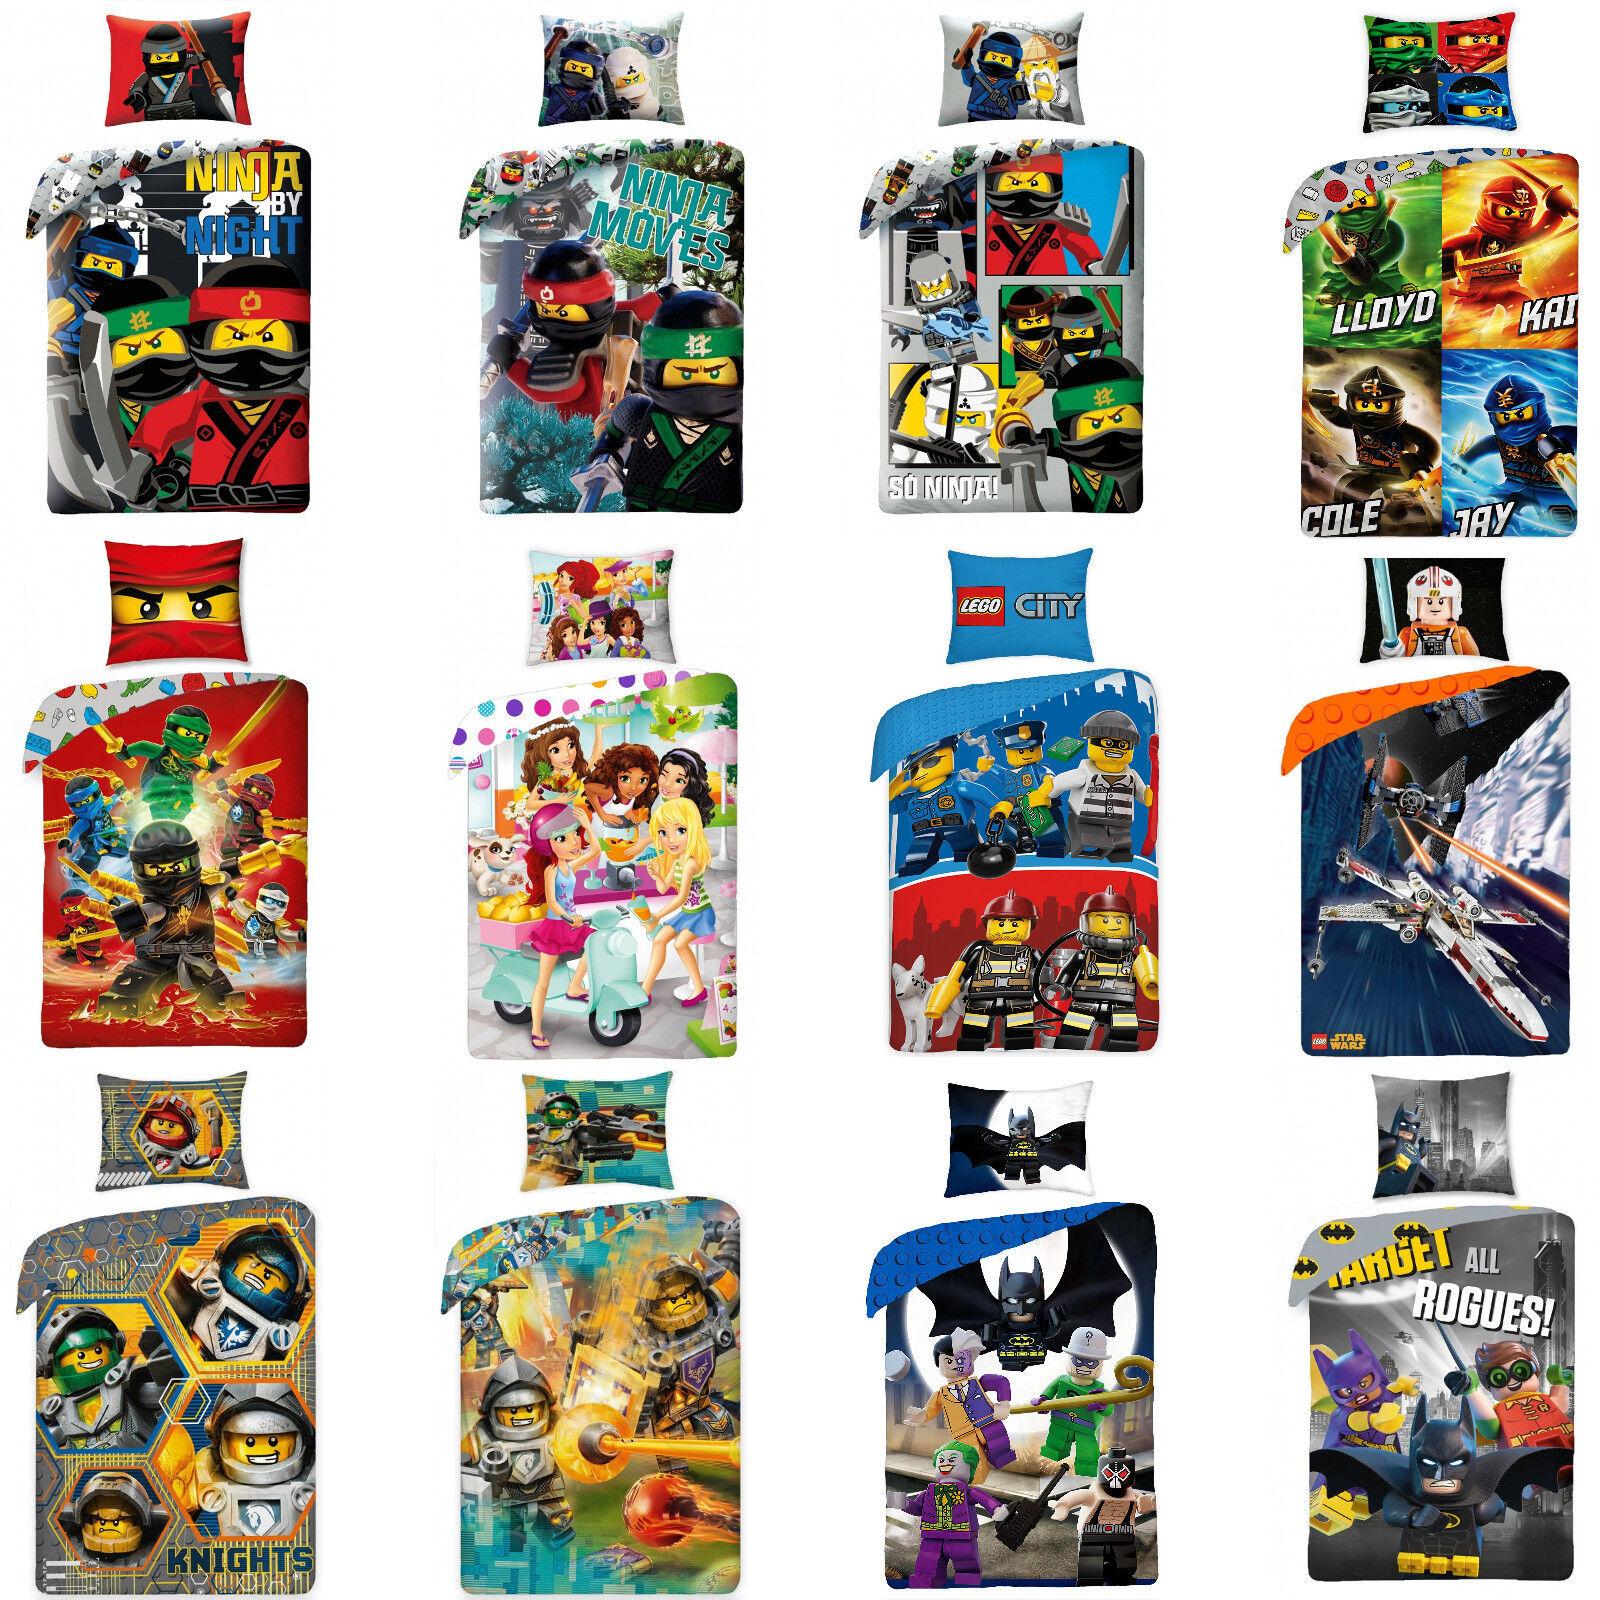 LEGO NINJAGO CITY SUPER HEROES NEXO KNIGHTS Friends Star Wars Kinderbettwäsche